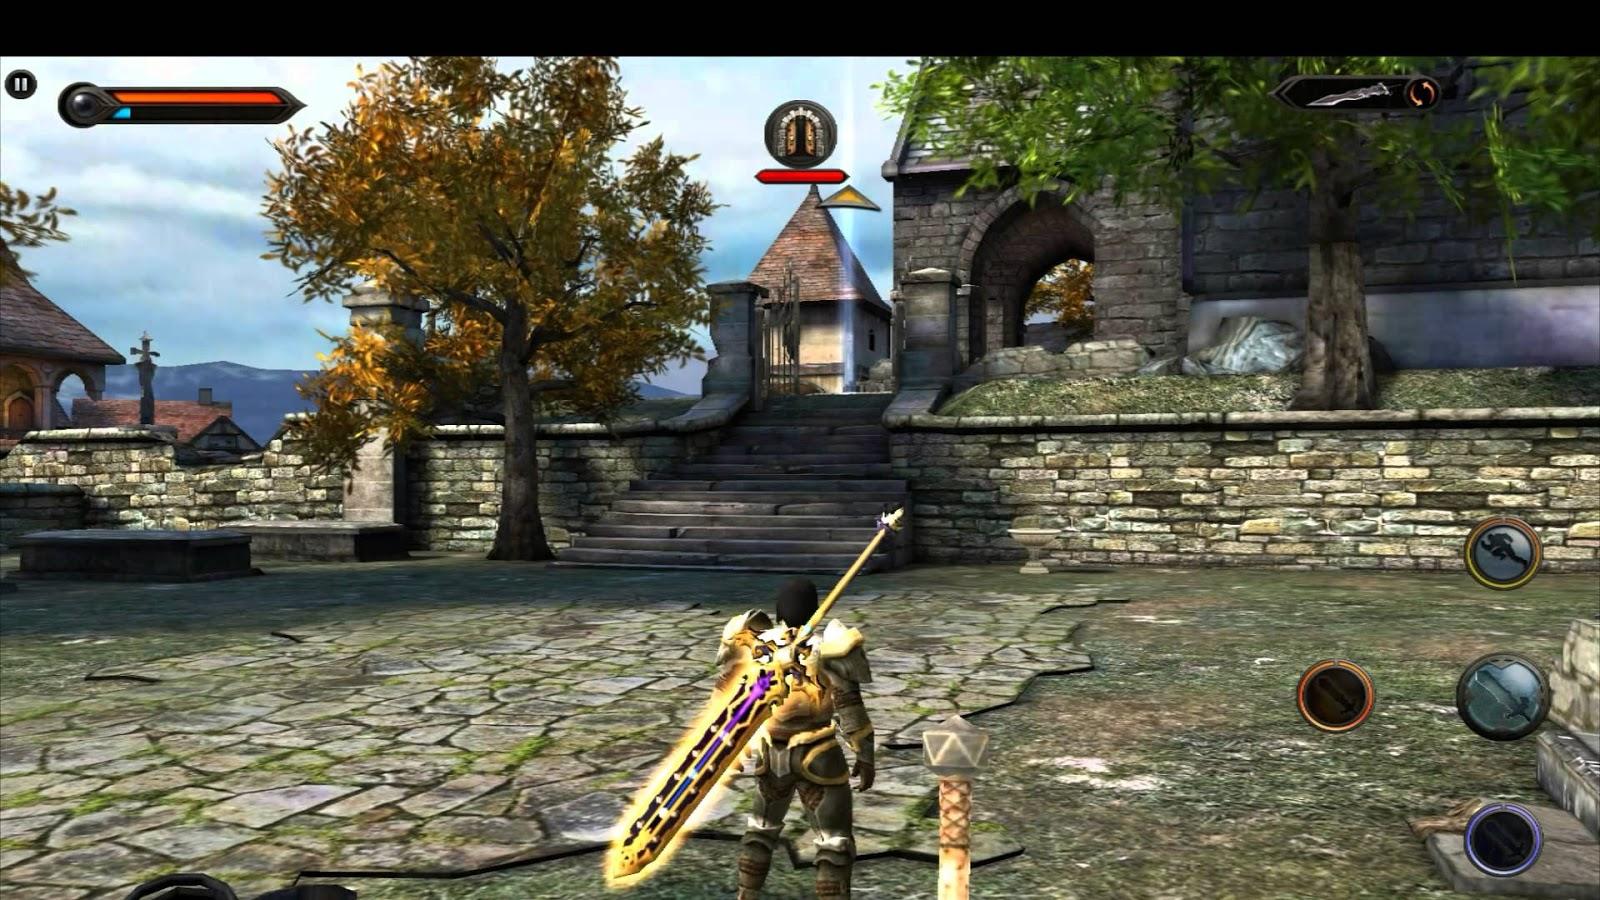 wild blood 1.1.3 mod apk free download